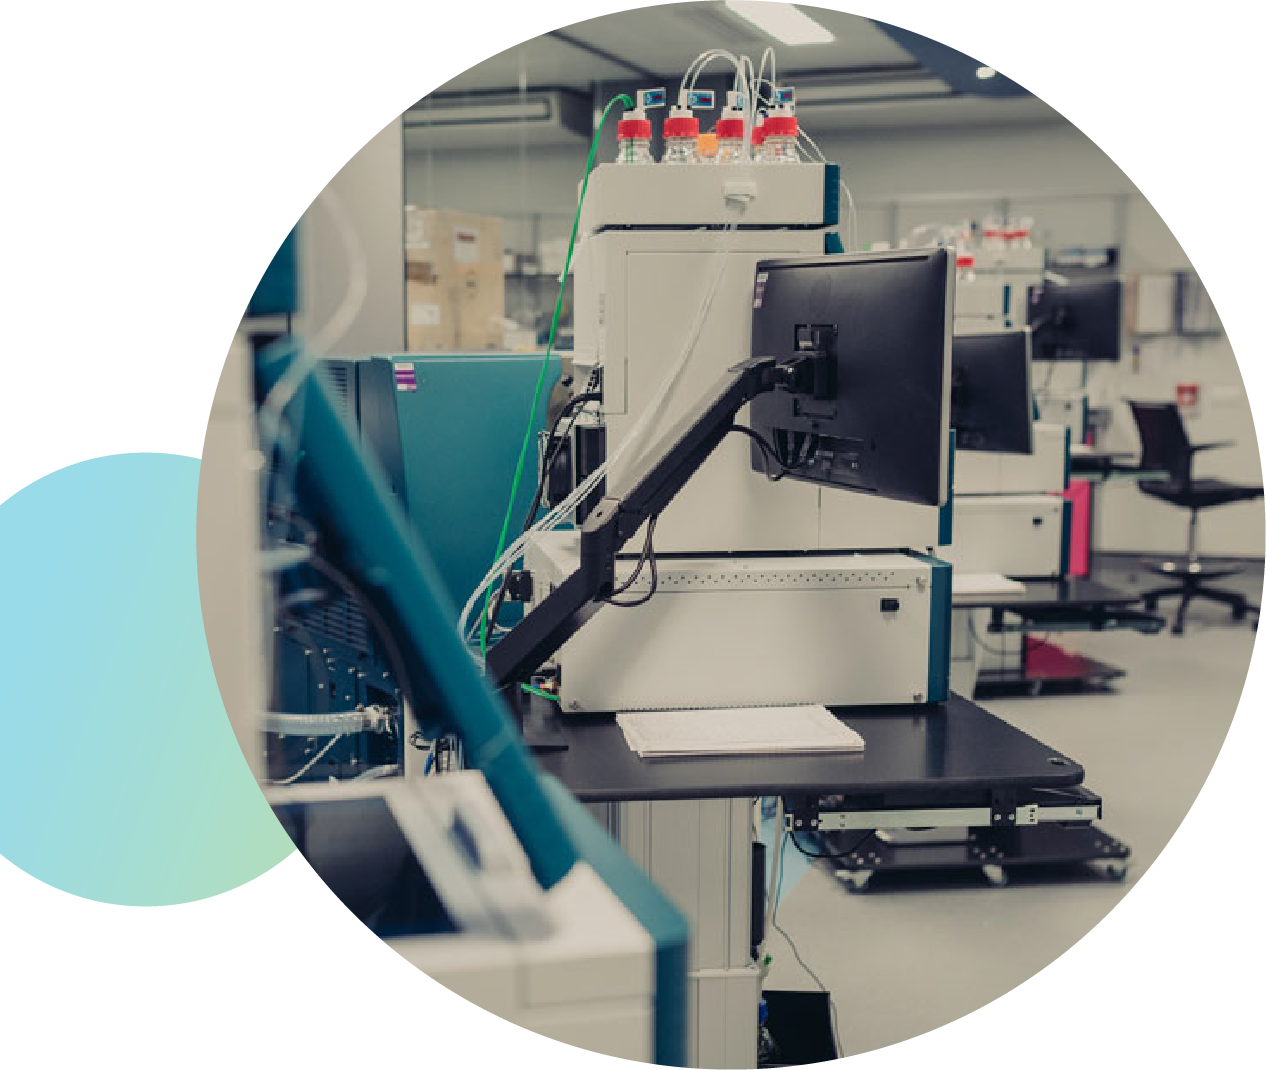 KScan phosphoproteomics platform